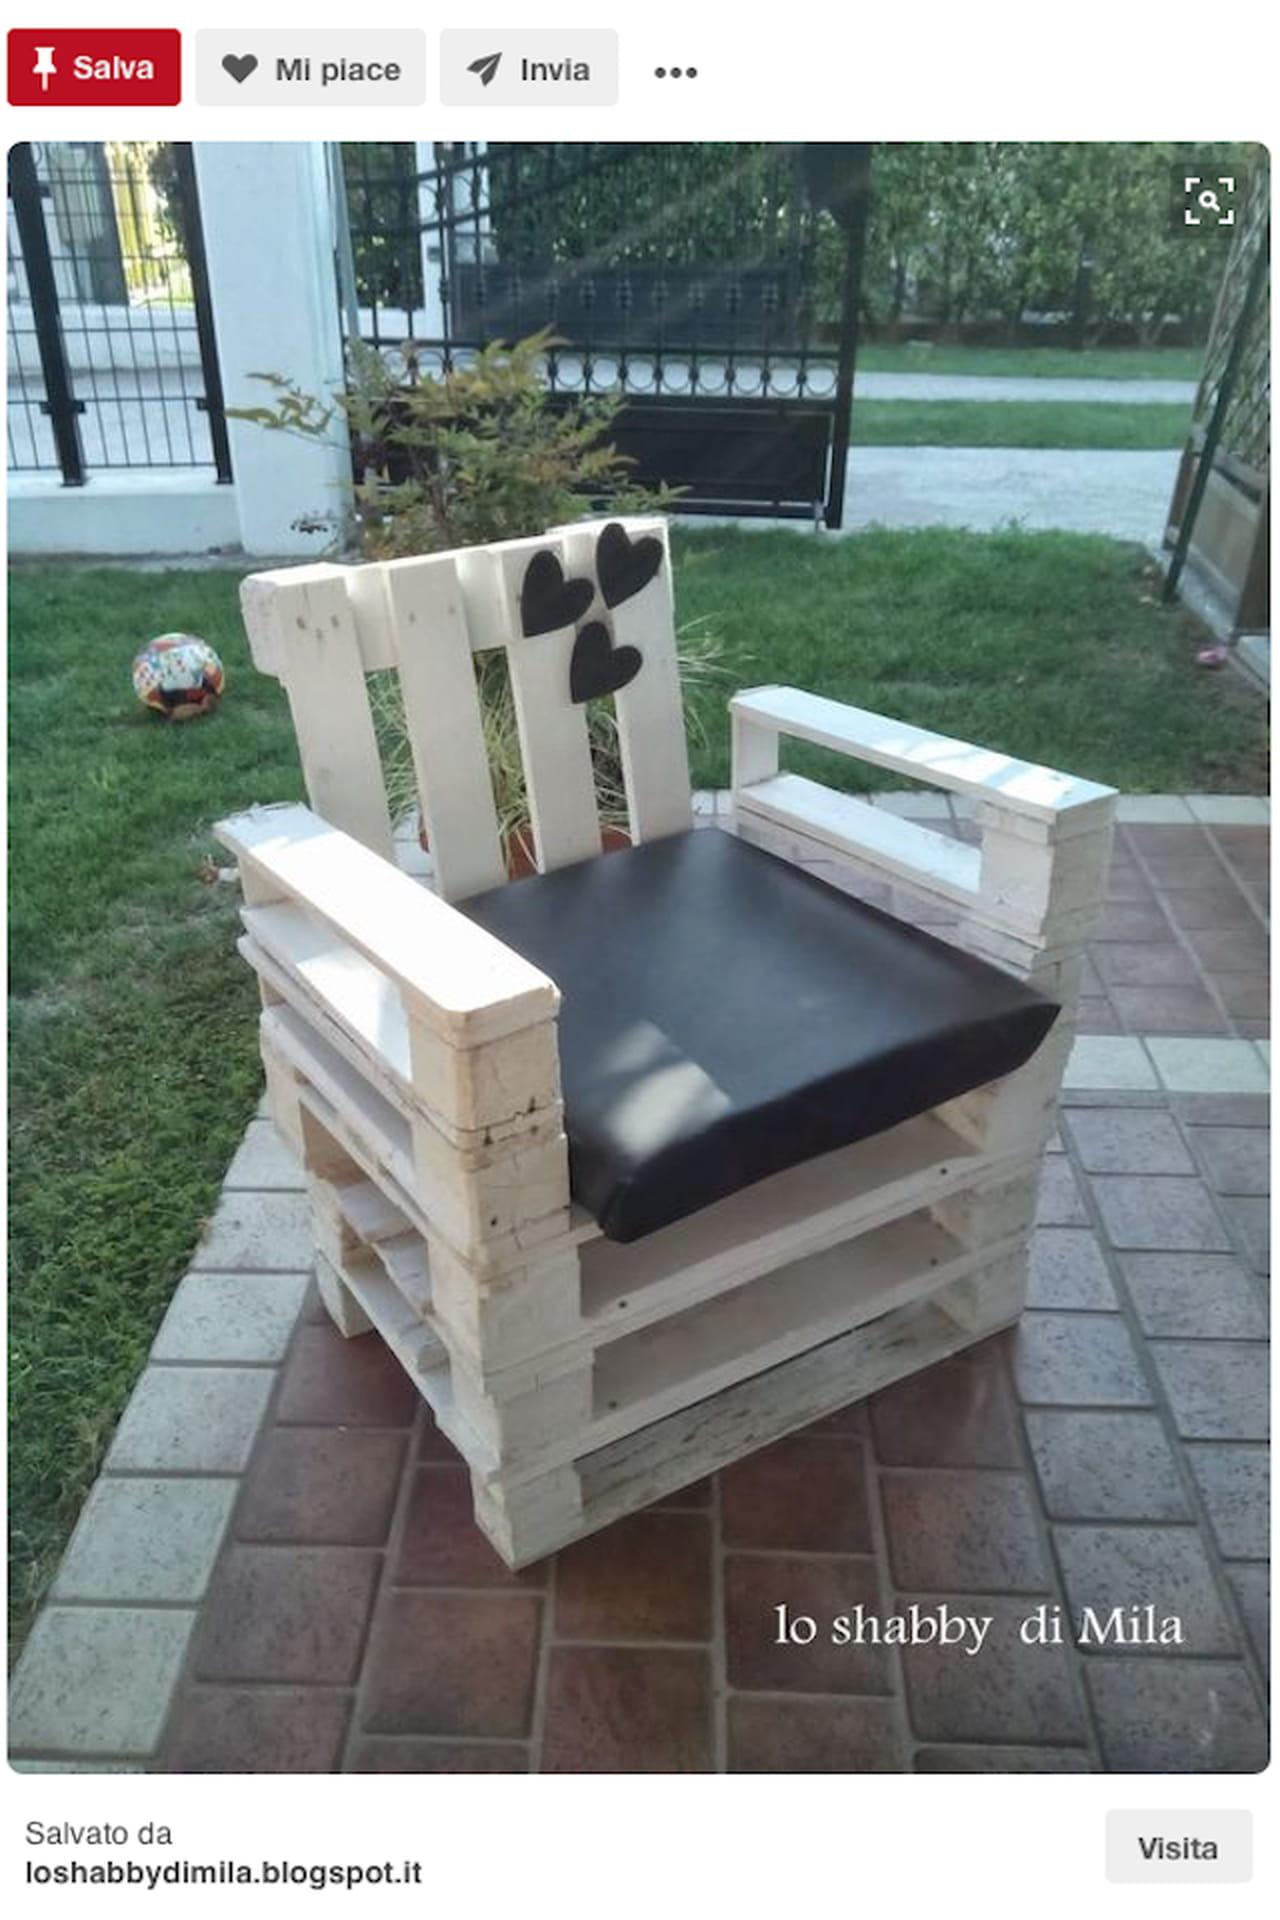 creazioni fai da te: idee giardino da pinterest - Mobili Da Giardino Idee Dipinte